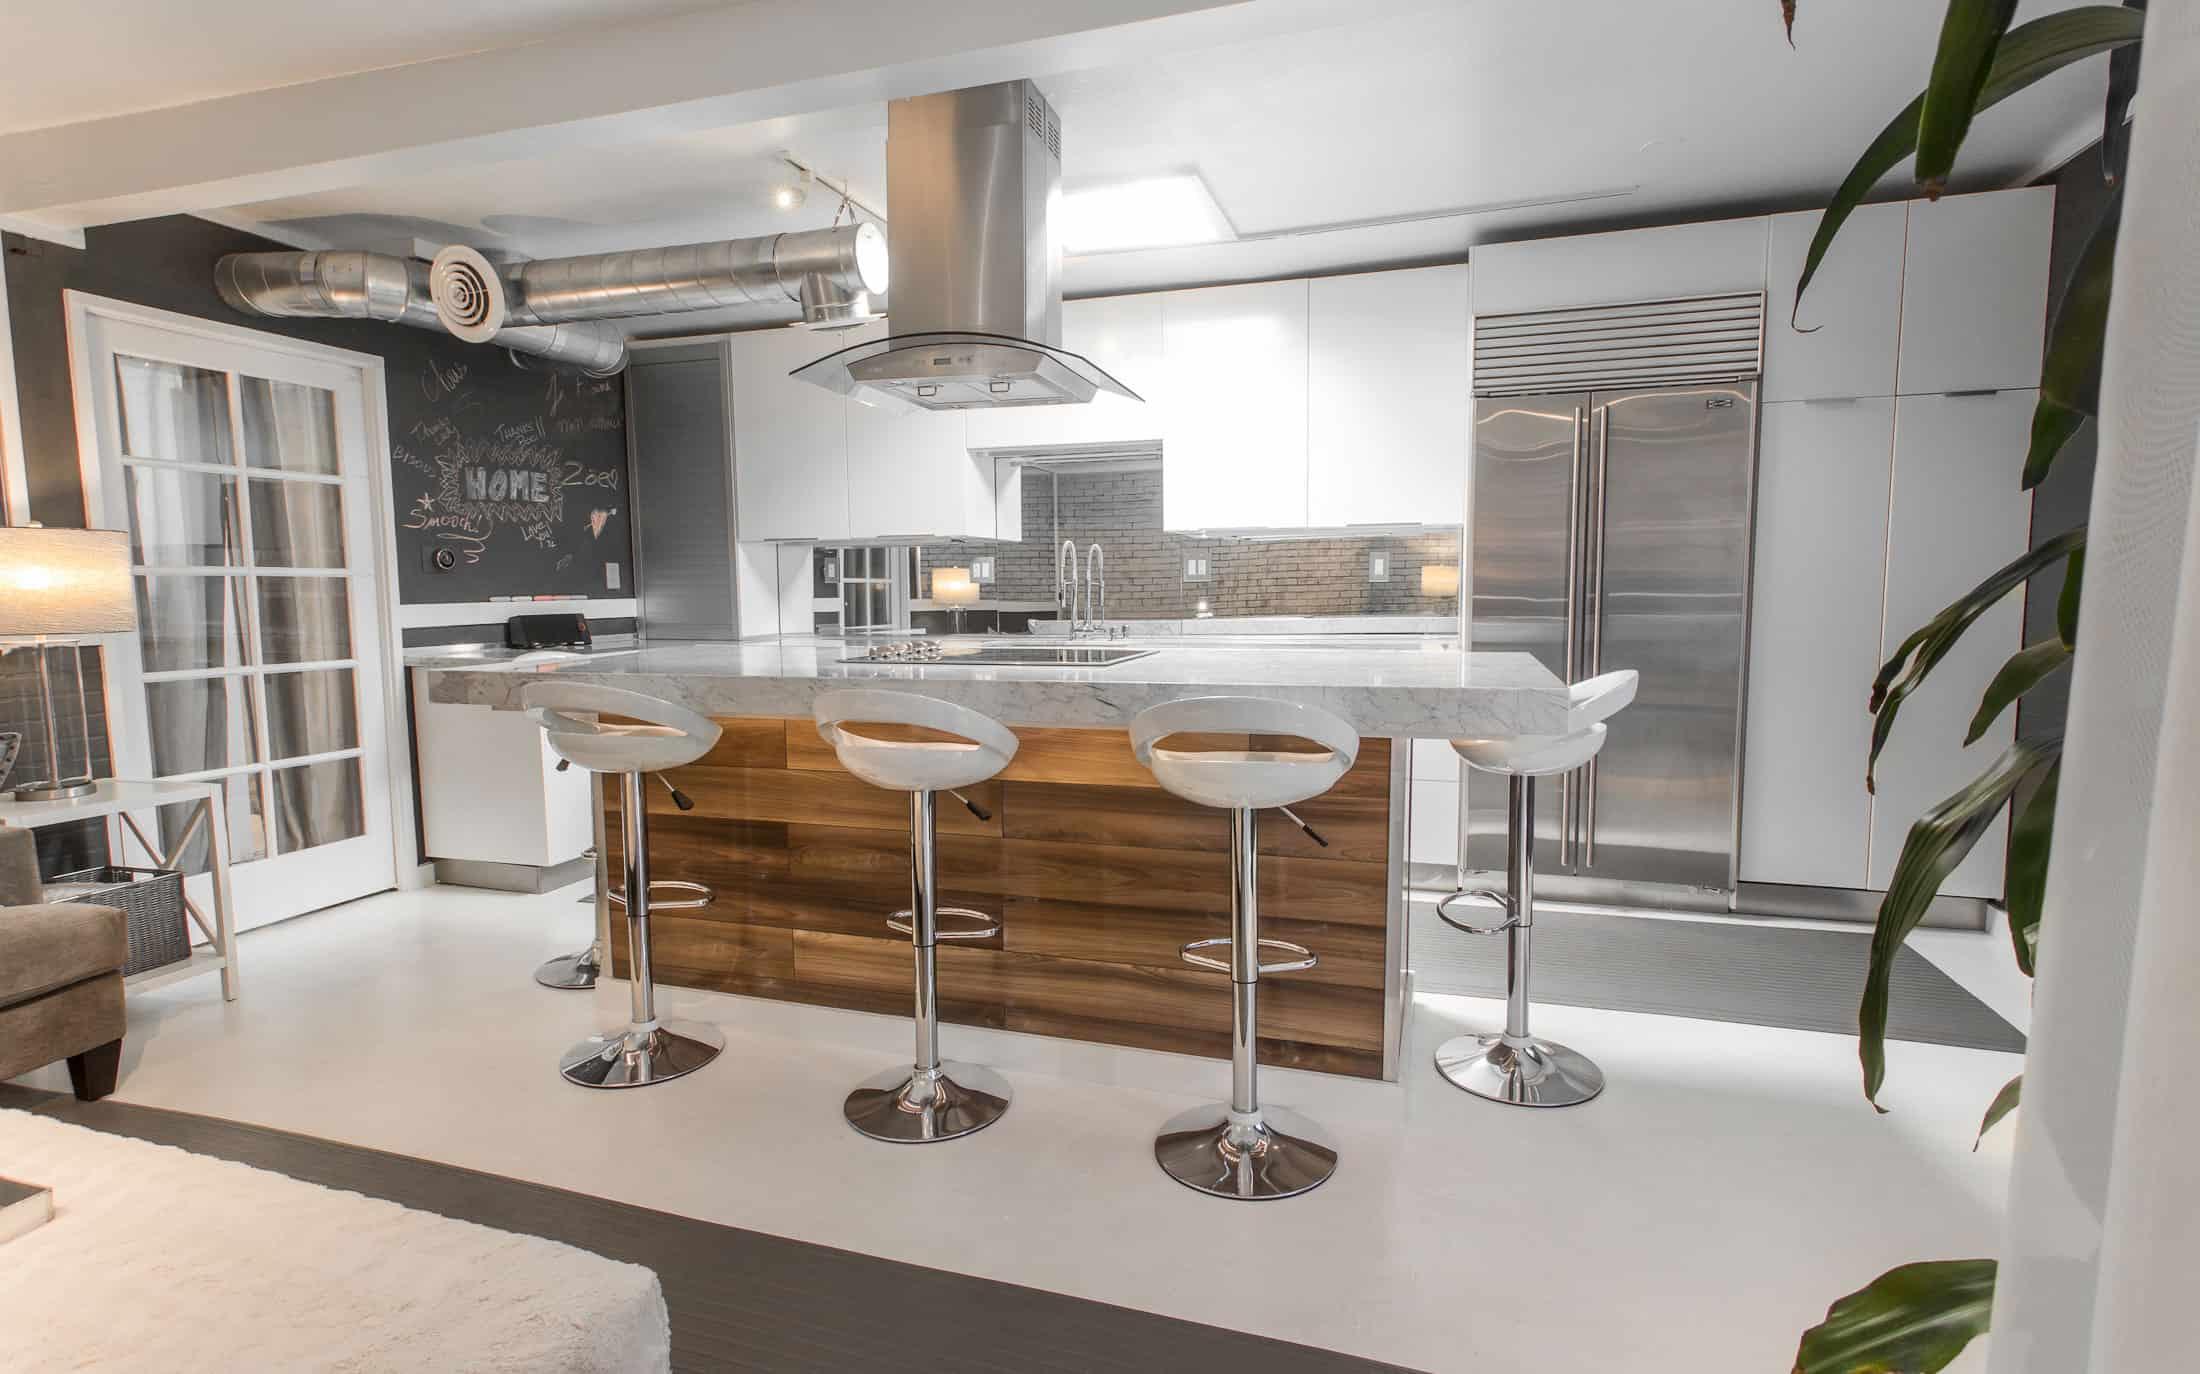 Modernit Luxe Et Elgance By Merlin Bergeron Design